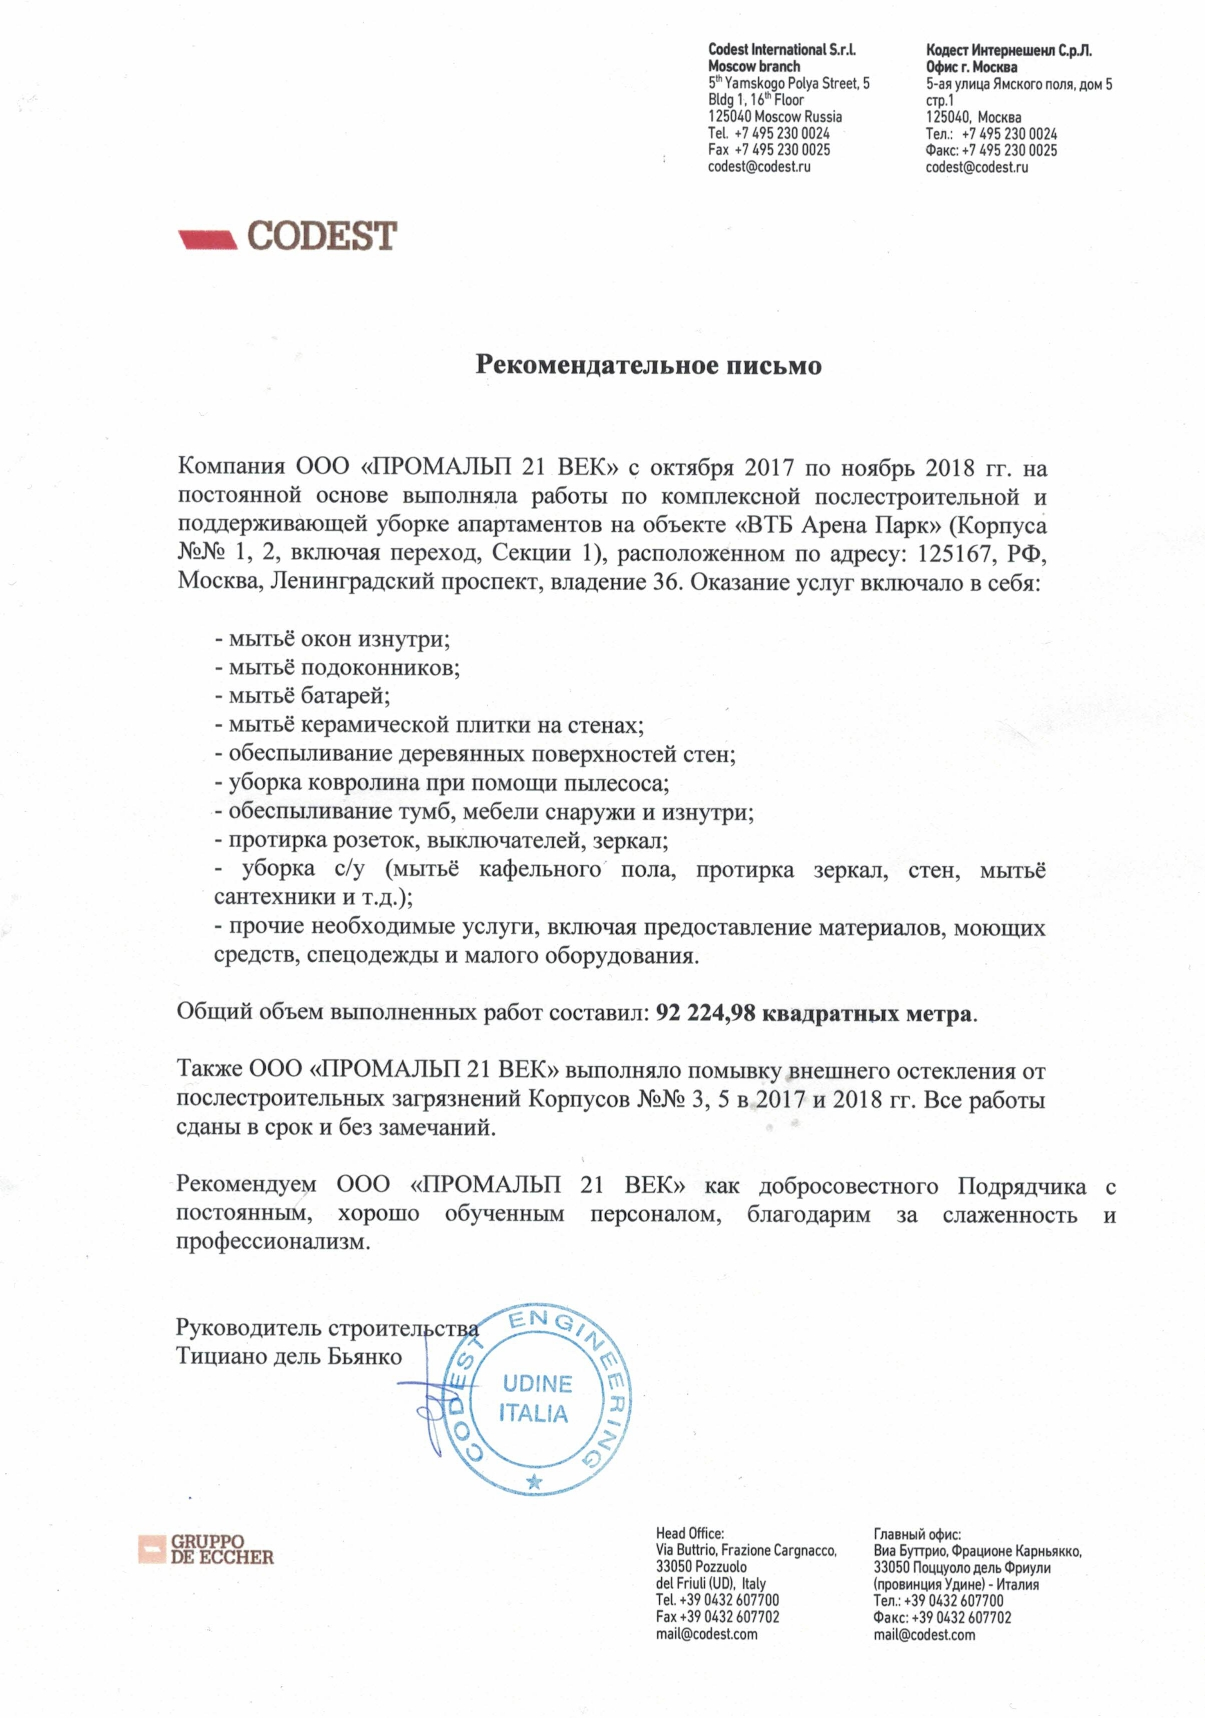 CODEST ENGINEERING S.r.l  – Рекомендация